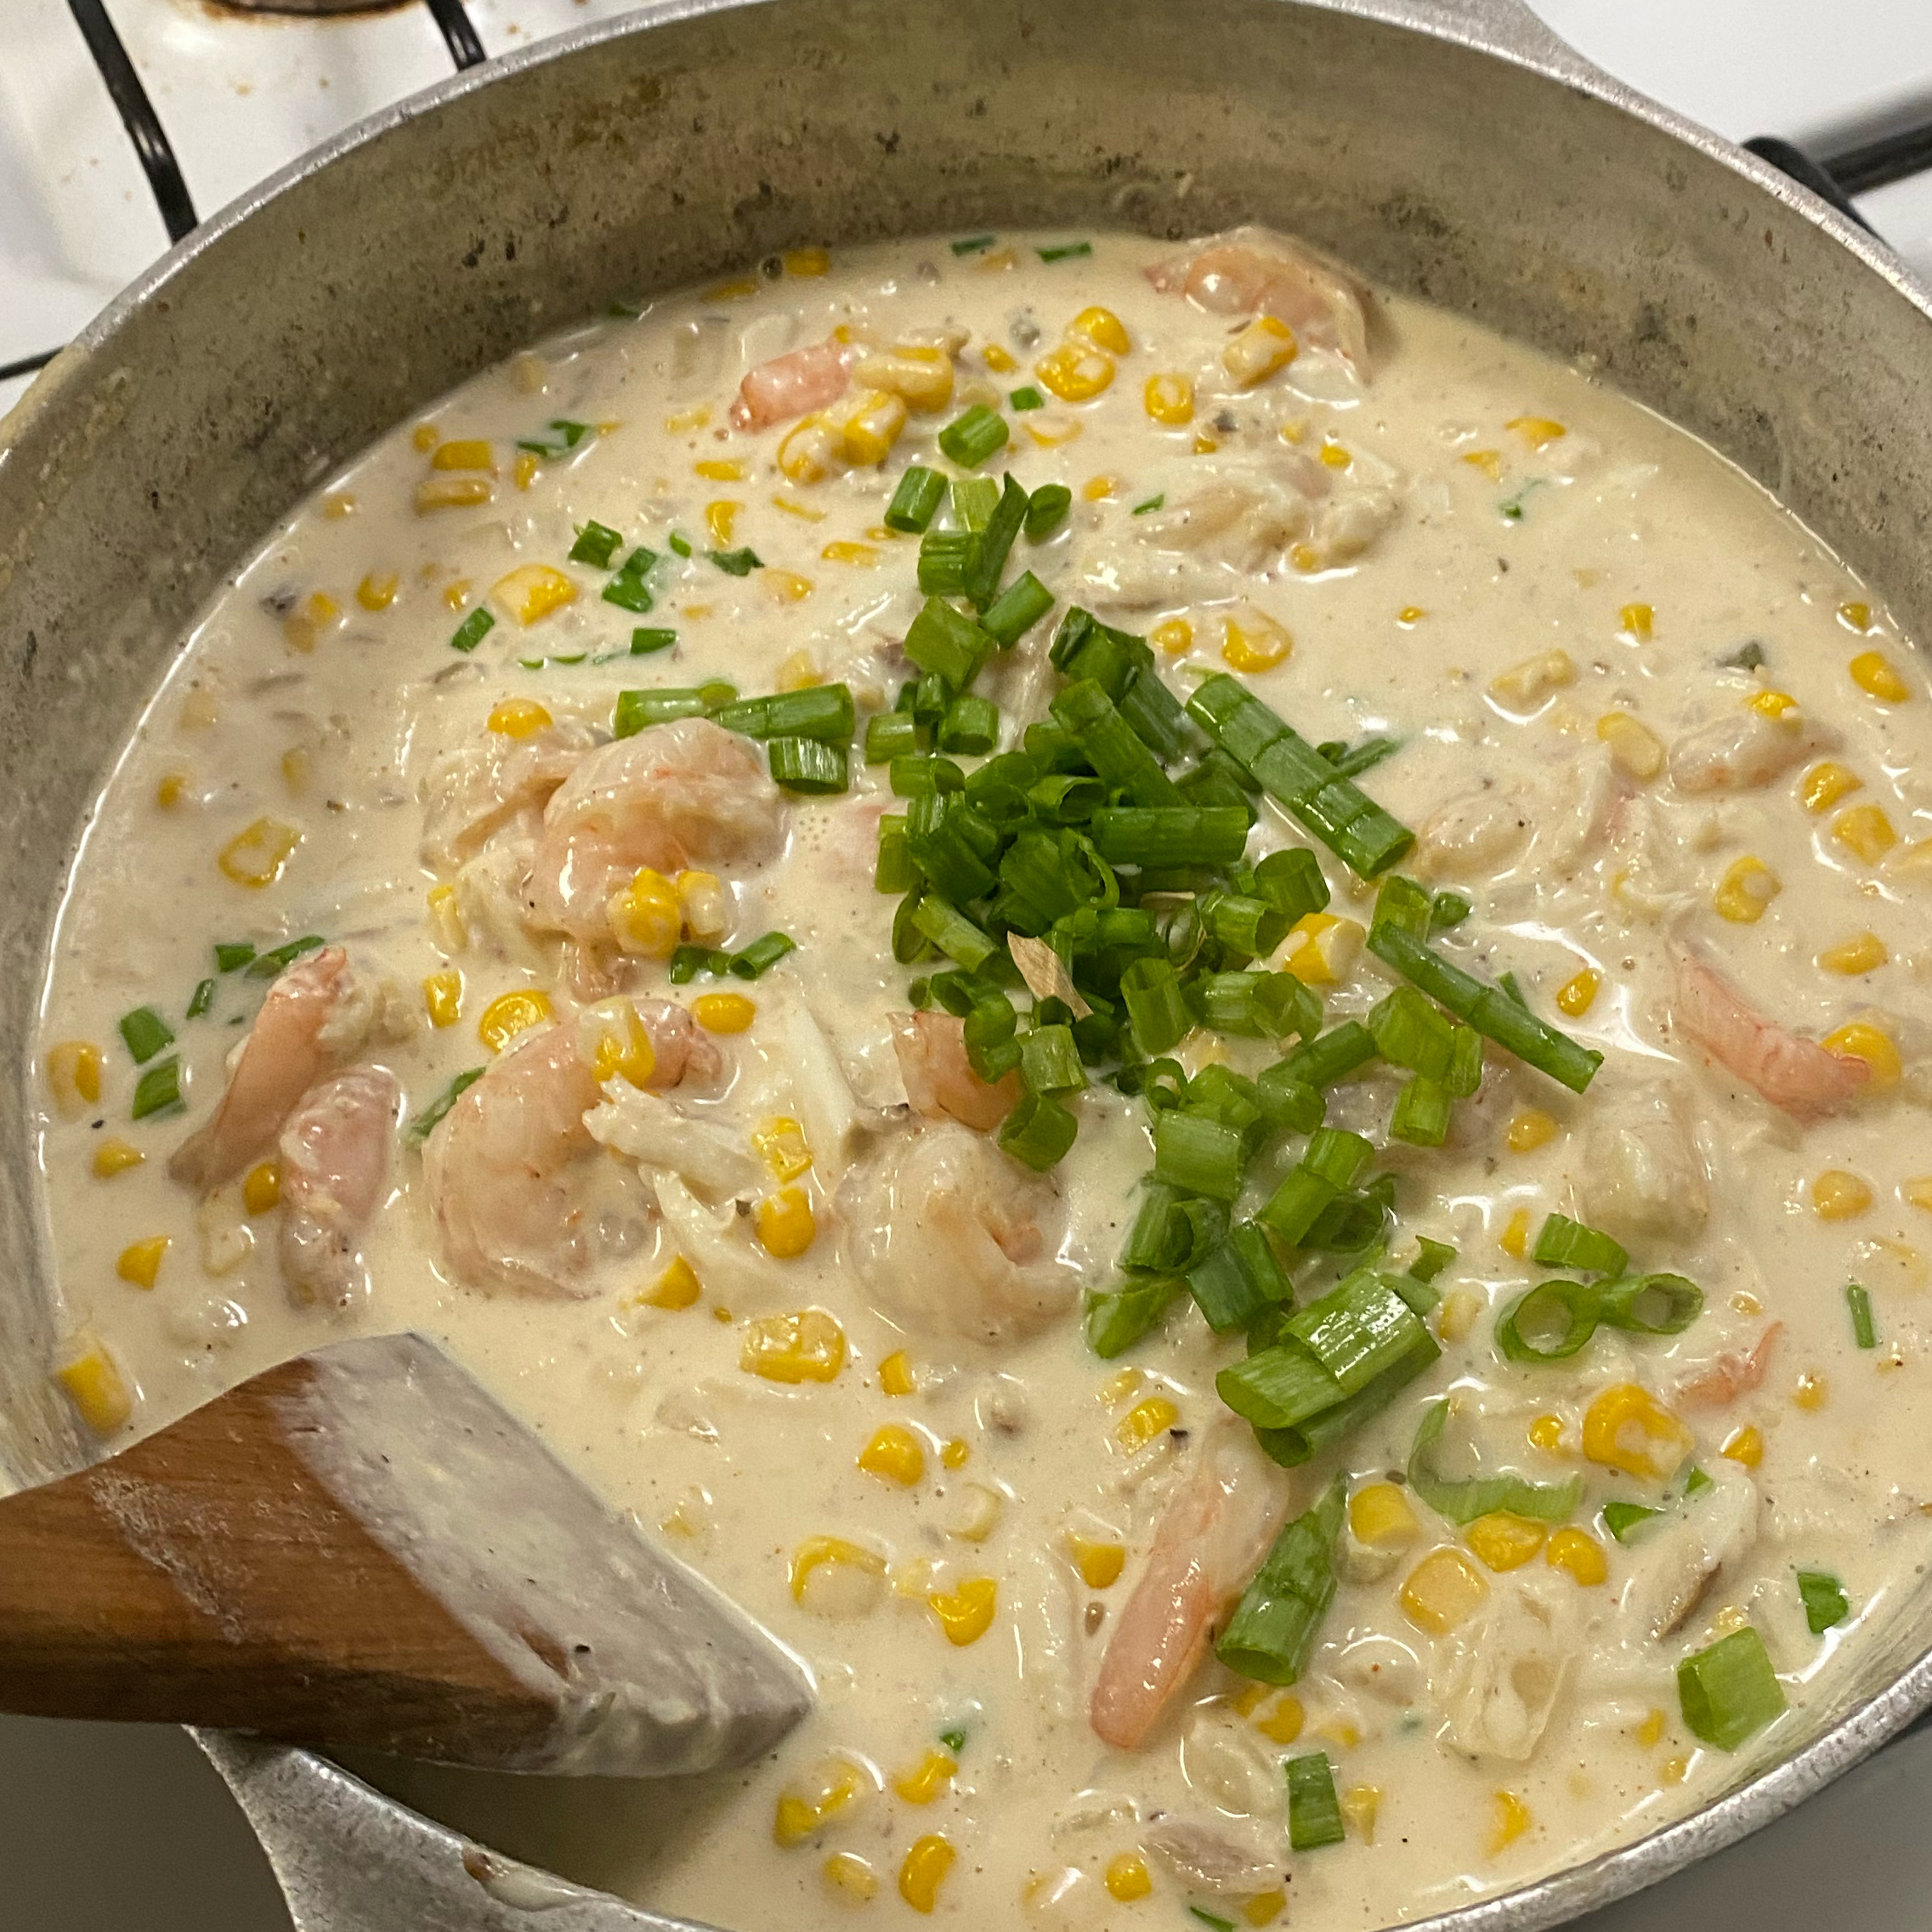 Cajun Corn and Crab Bisque